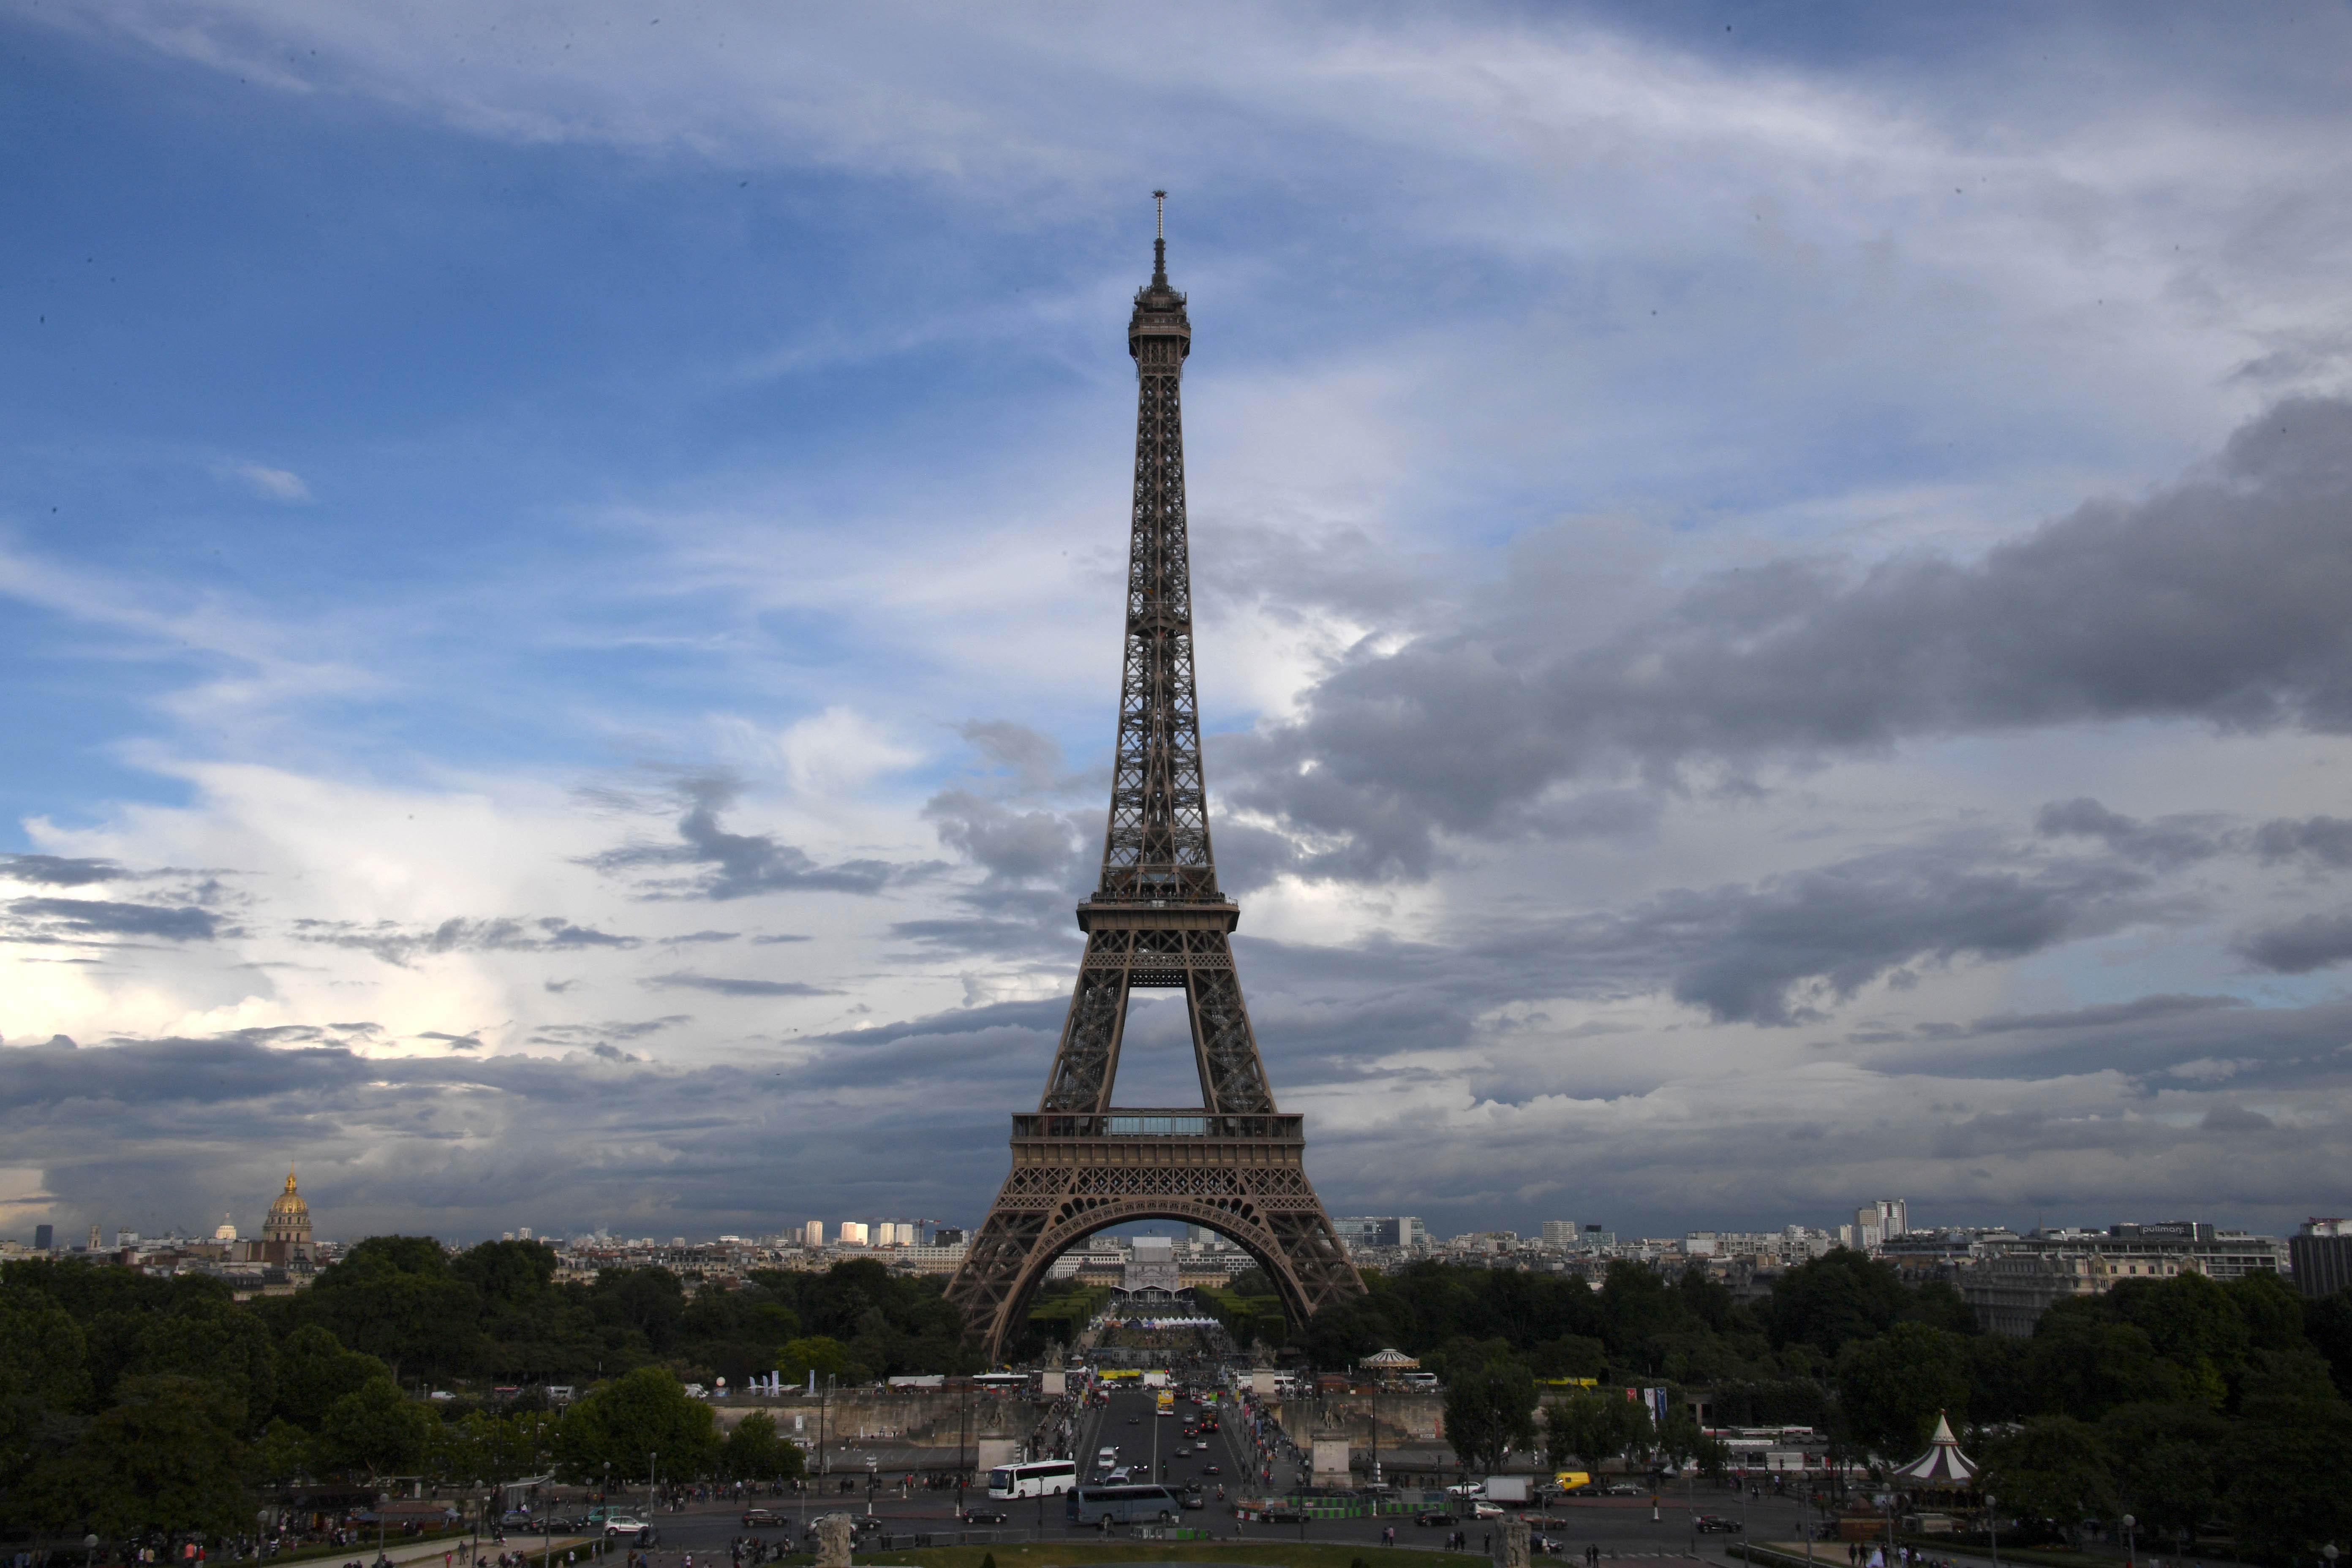 Olympic Preview: Paris 2024 Views